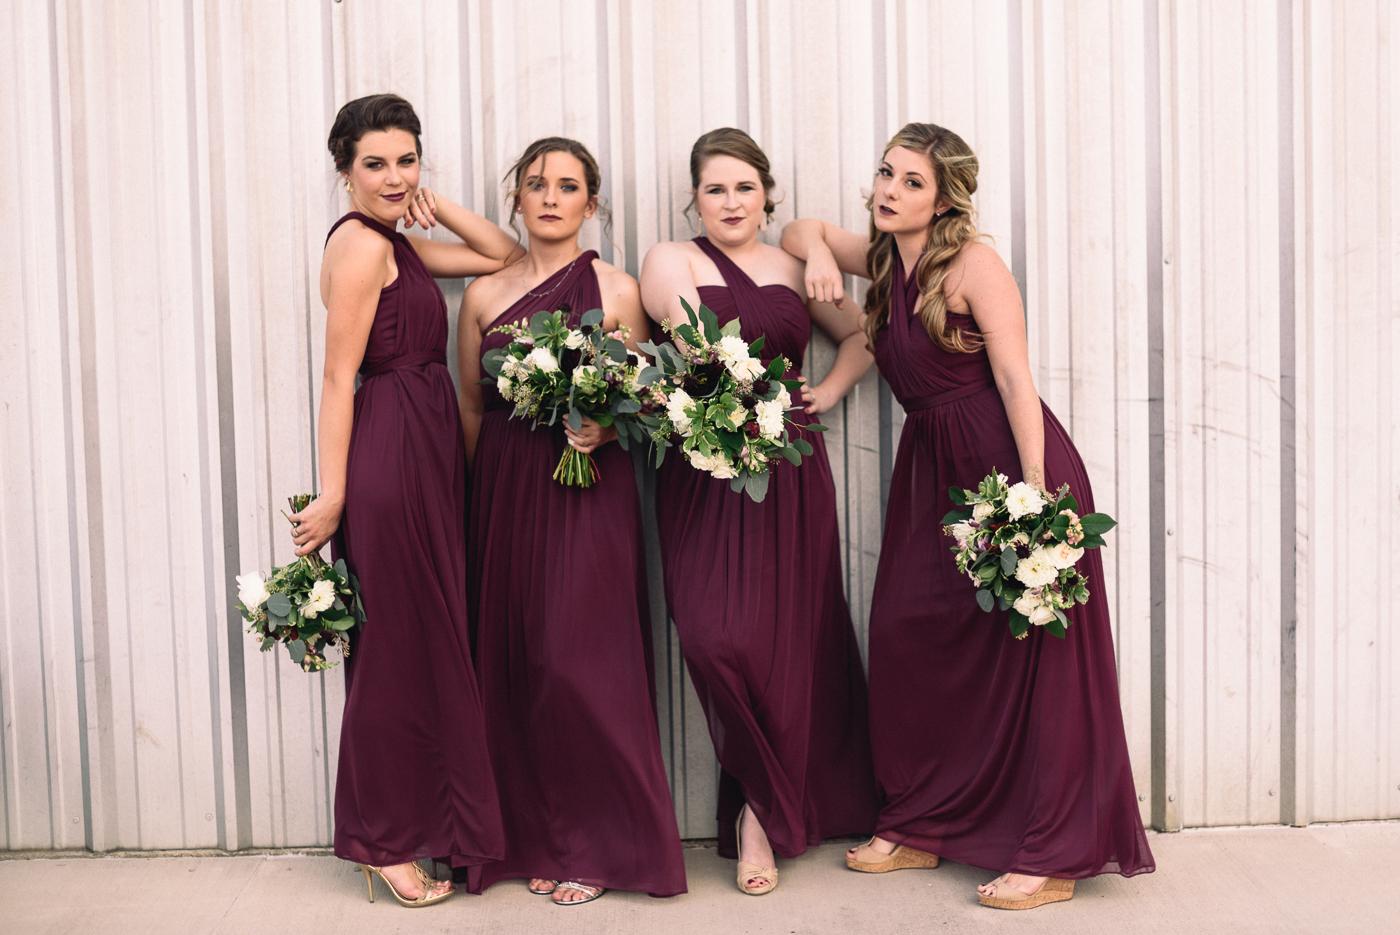 sassy bridesmaids maroon dresses bouquet